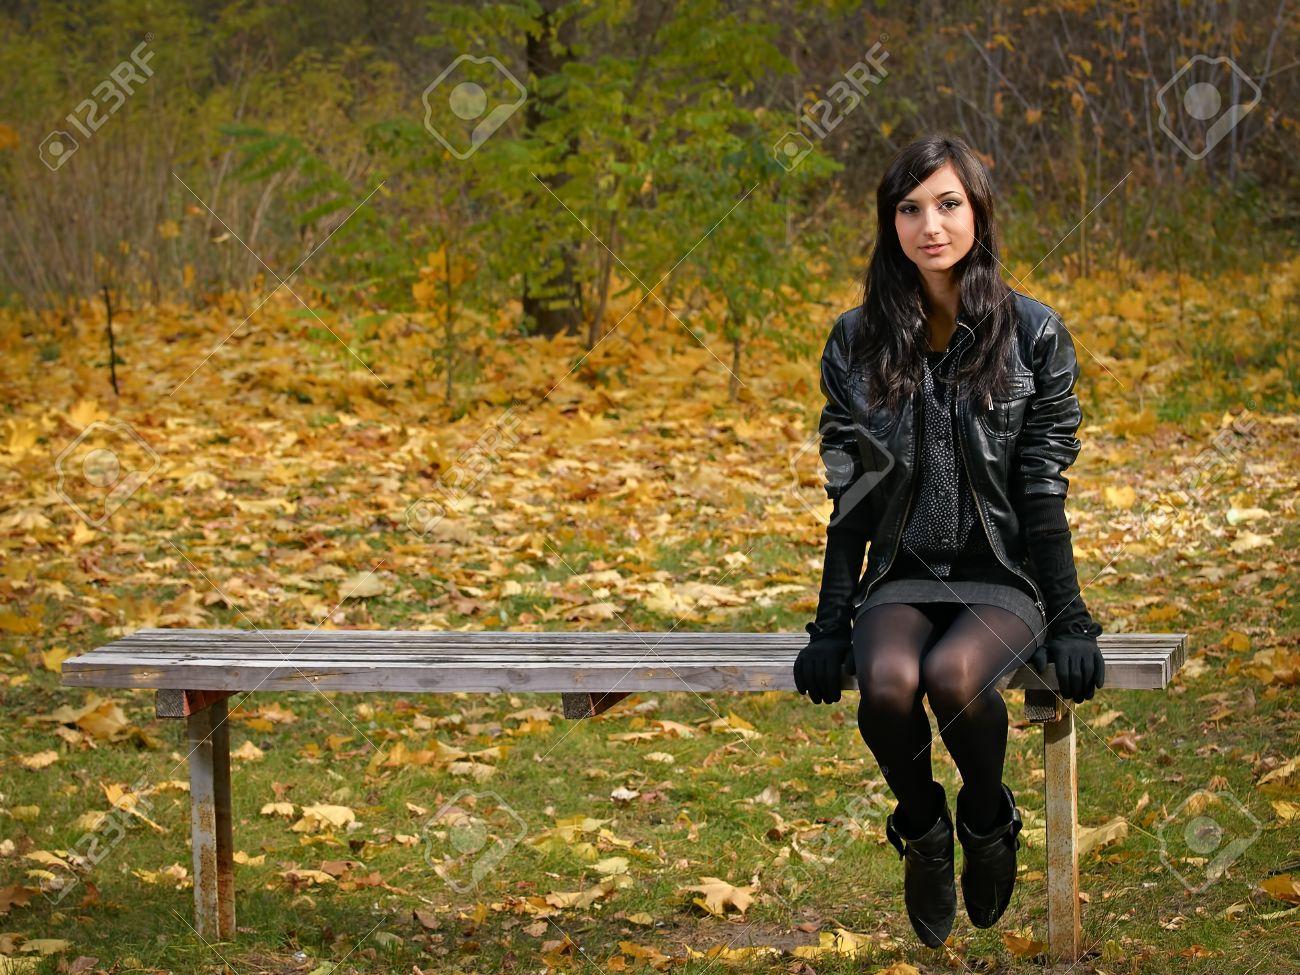 pretty girl alone in the park Stock Photo - 8785839